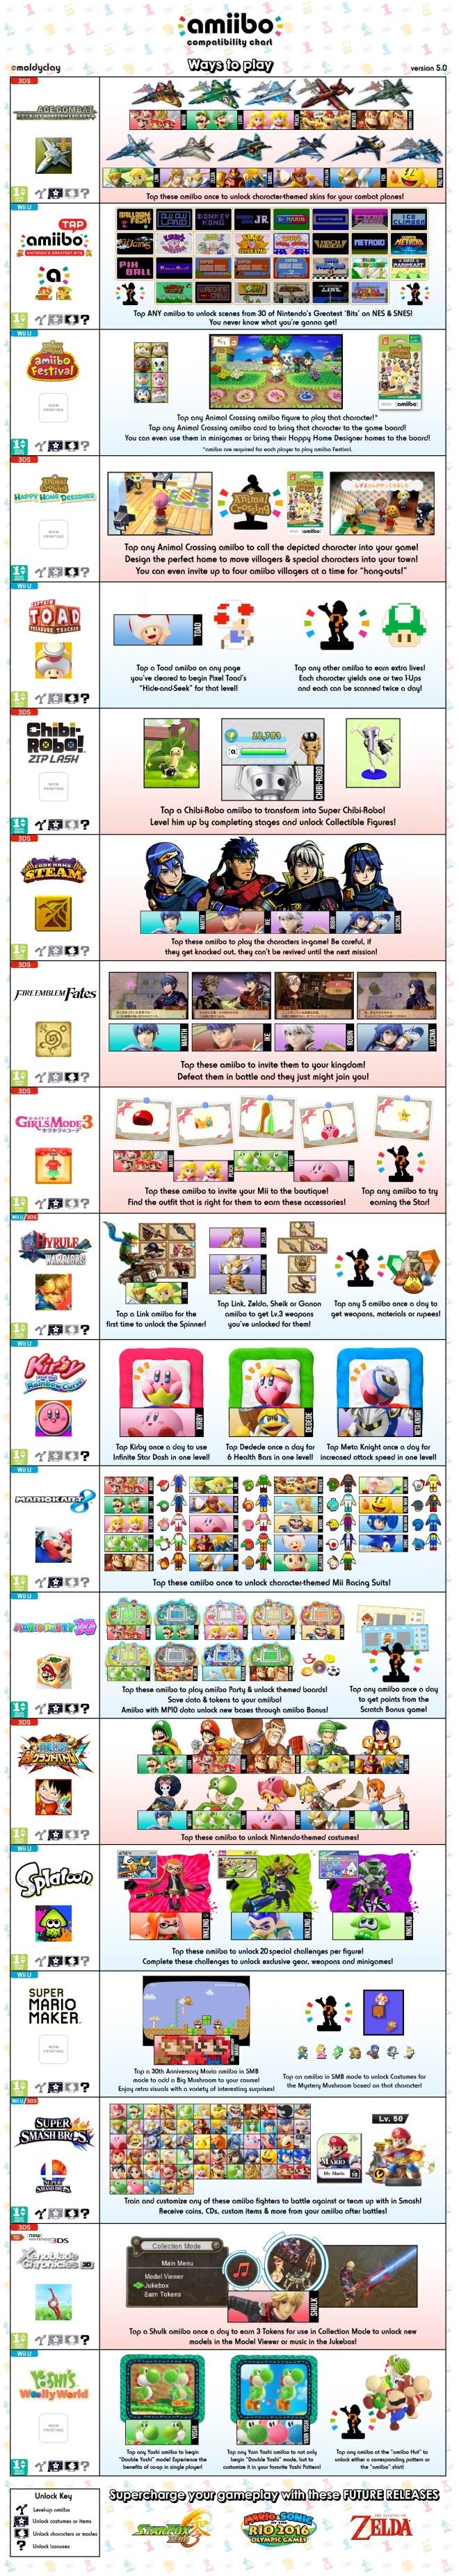 amiibo_chart_5